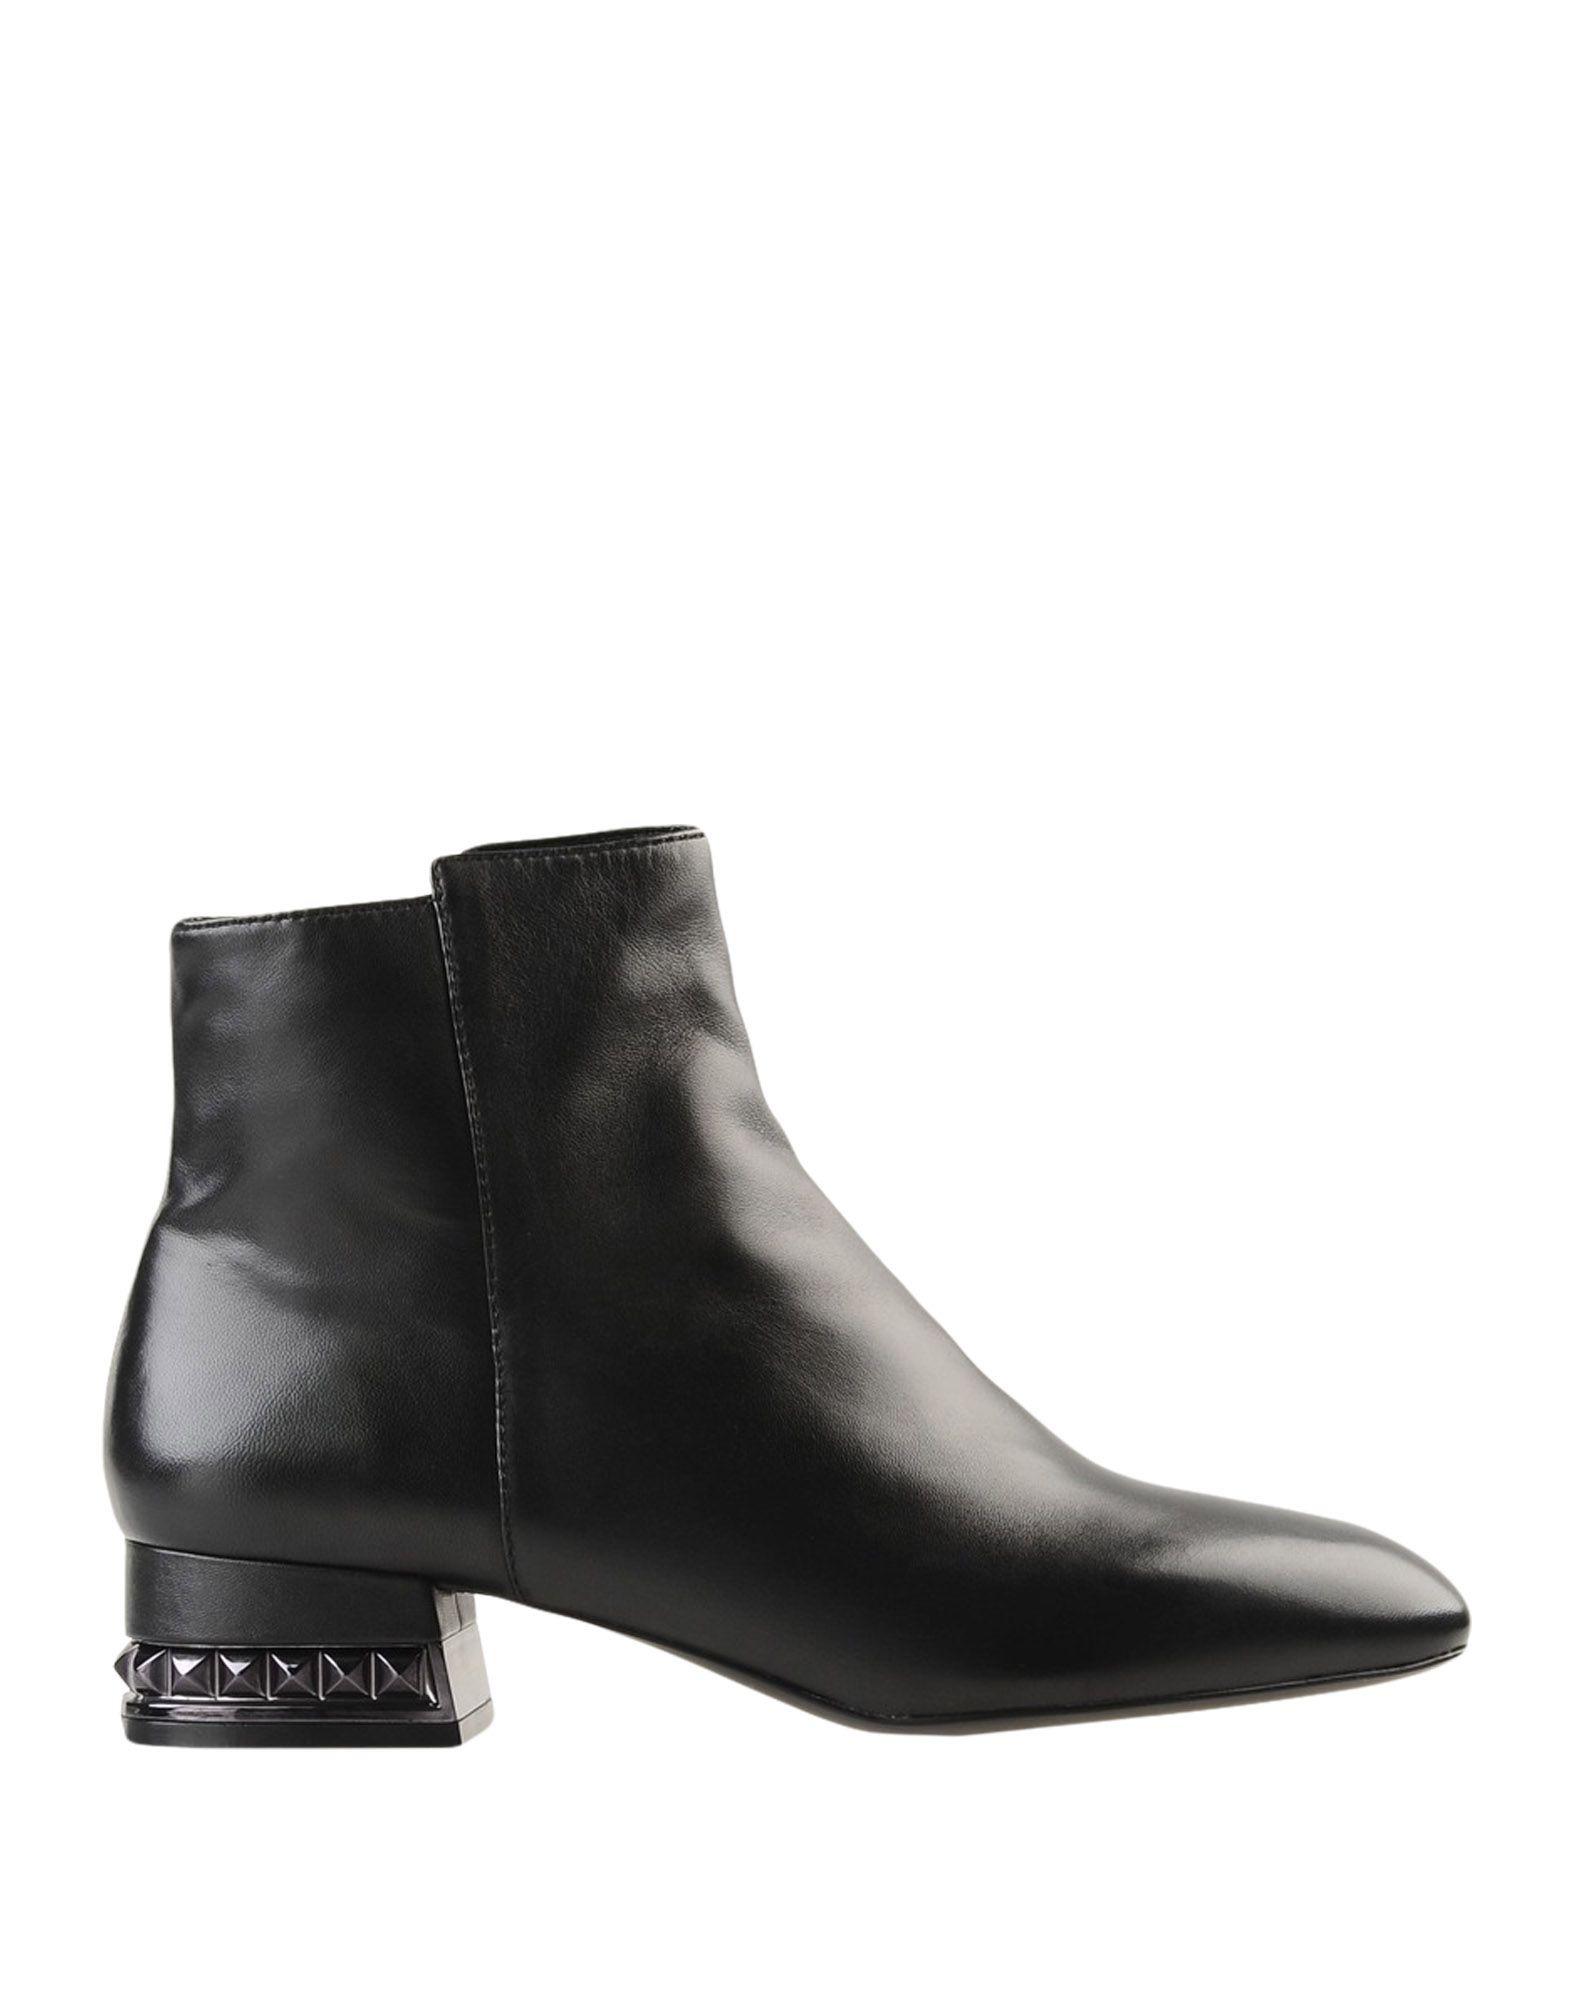 BRUNO PREMI Полусапоги и высокие ботинки bruno premi page 1